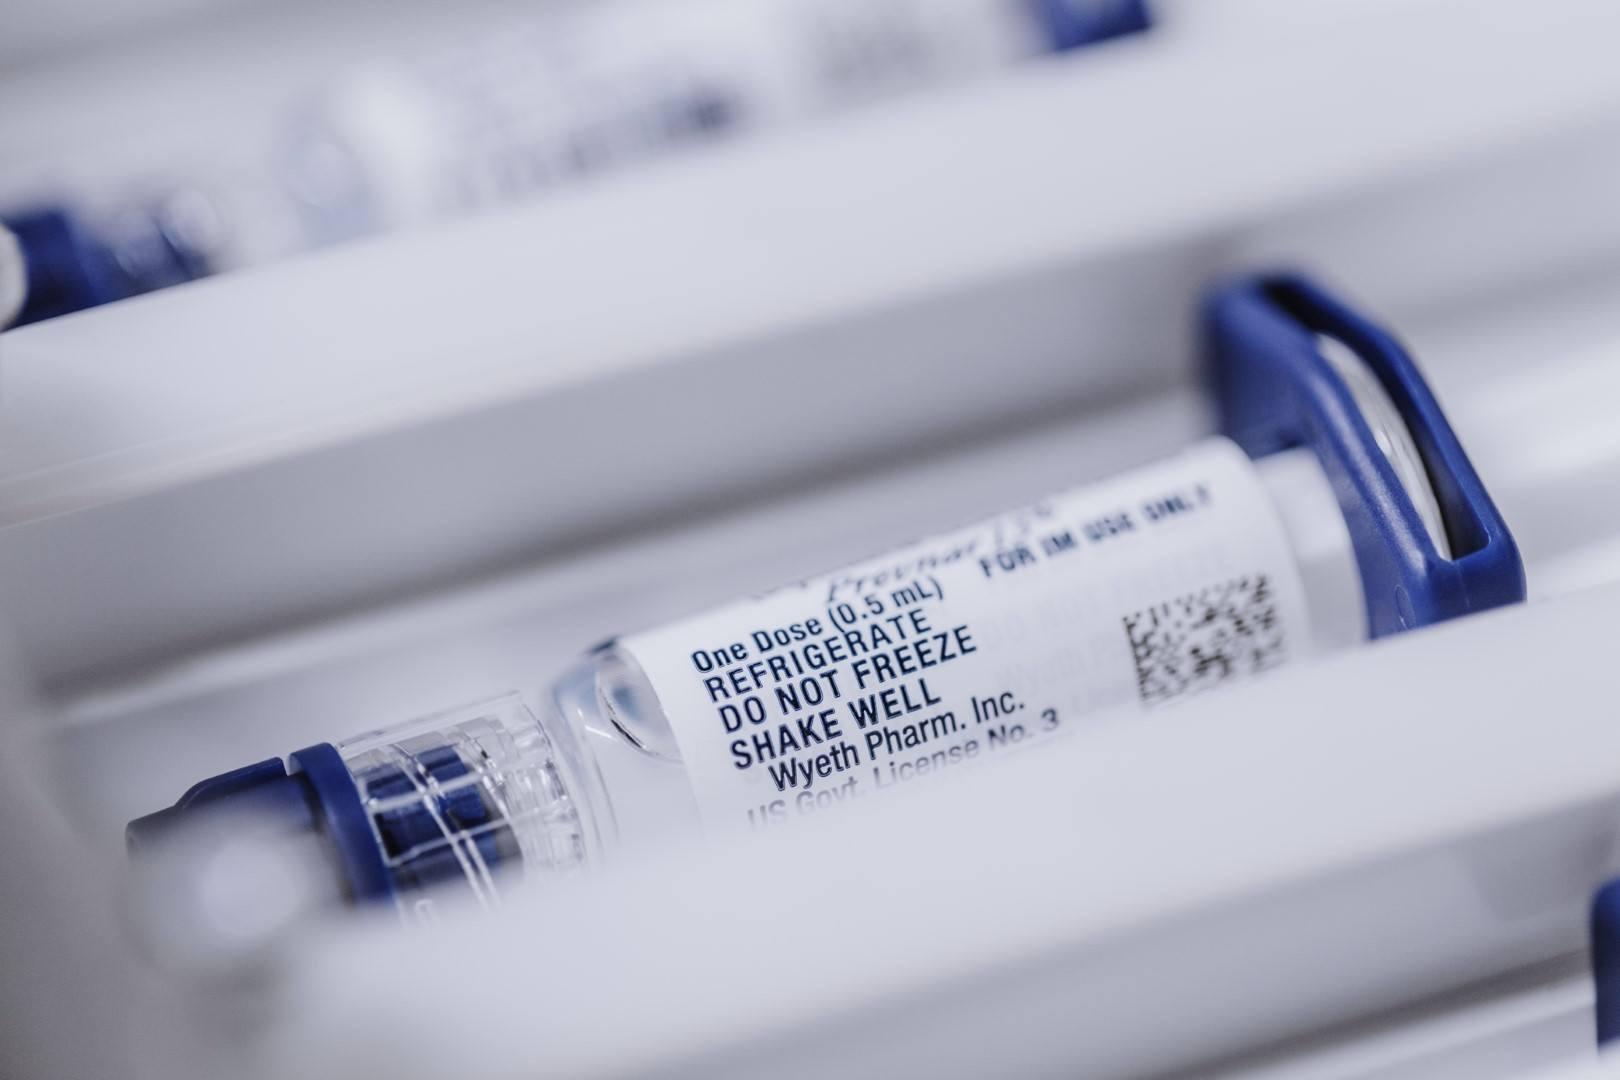 Vaccine vial in storage drawer